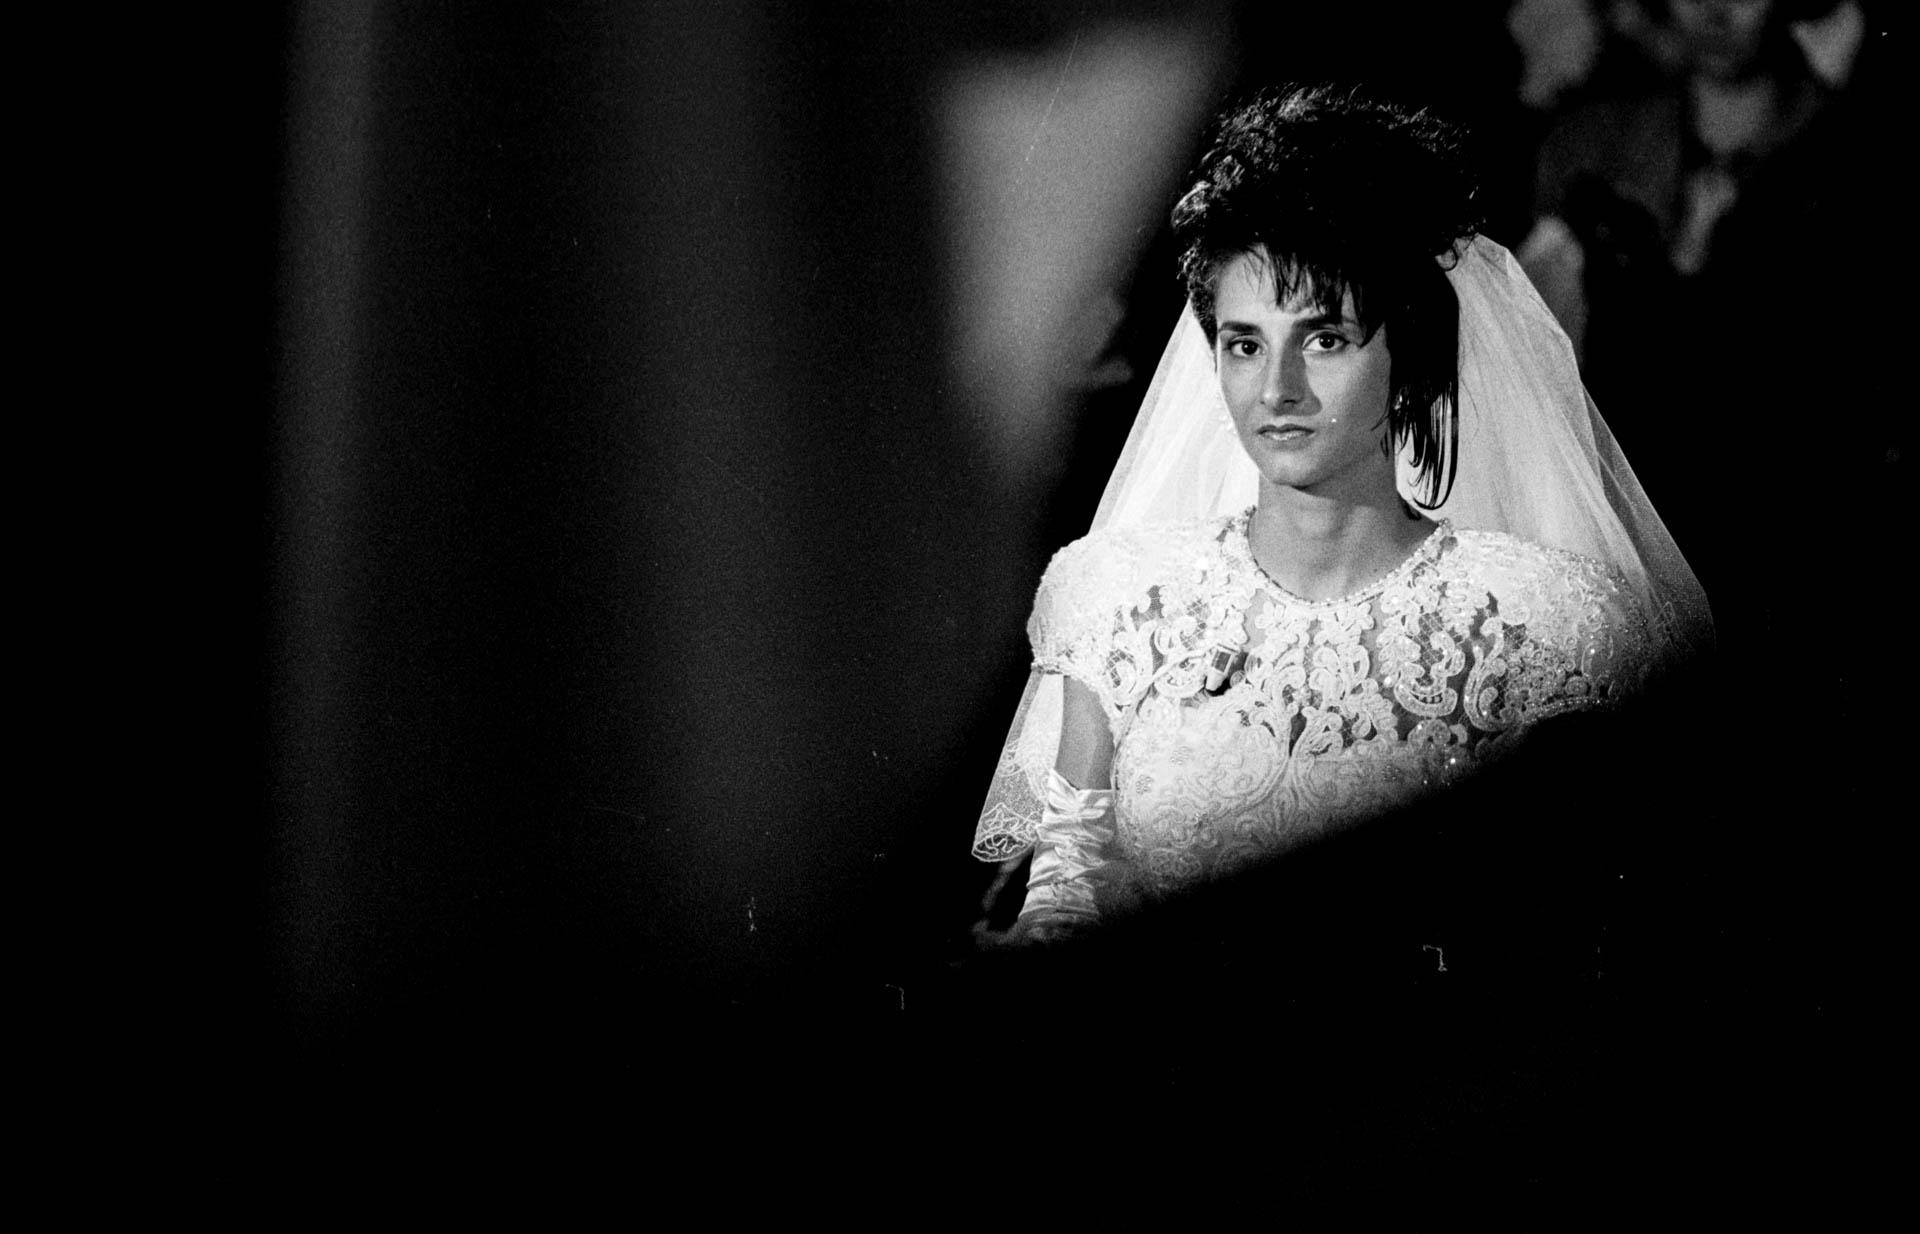 Matera, Italy - 19 October 1991 Italian Wedding.